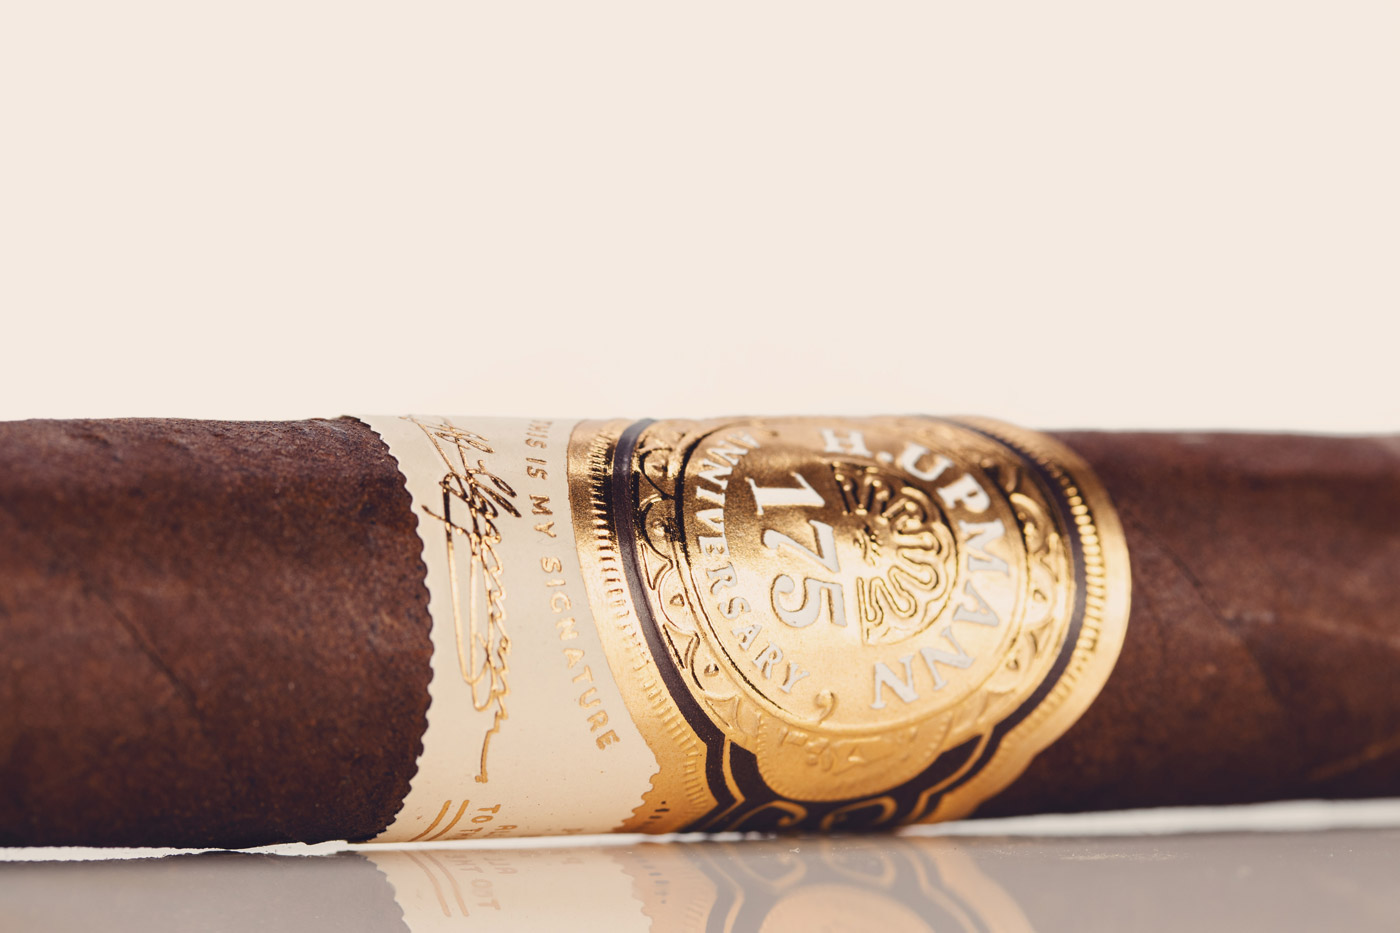 H. Upmann 175 Anniversary cigar review